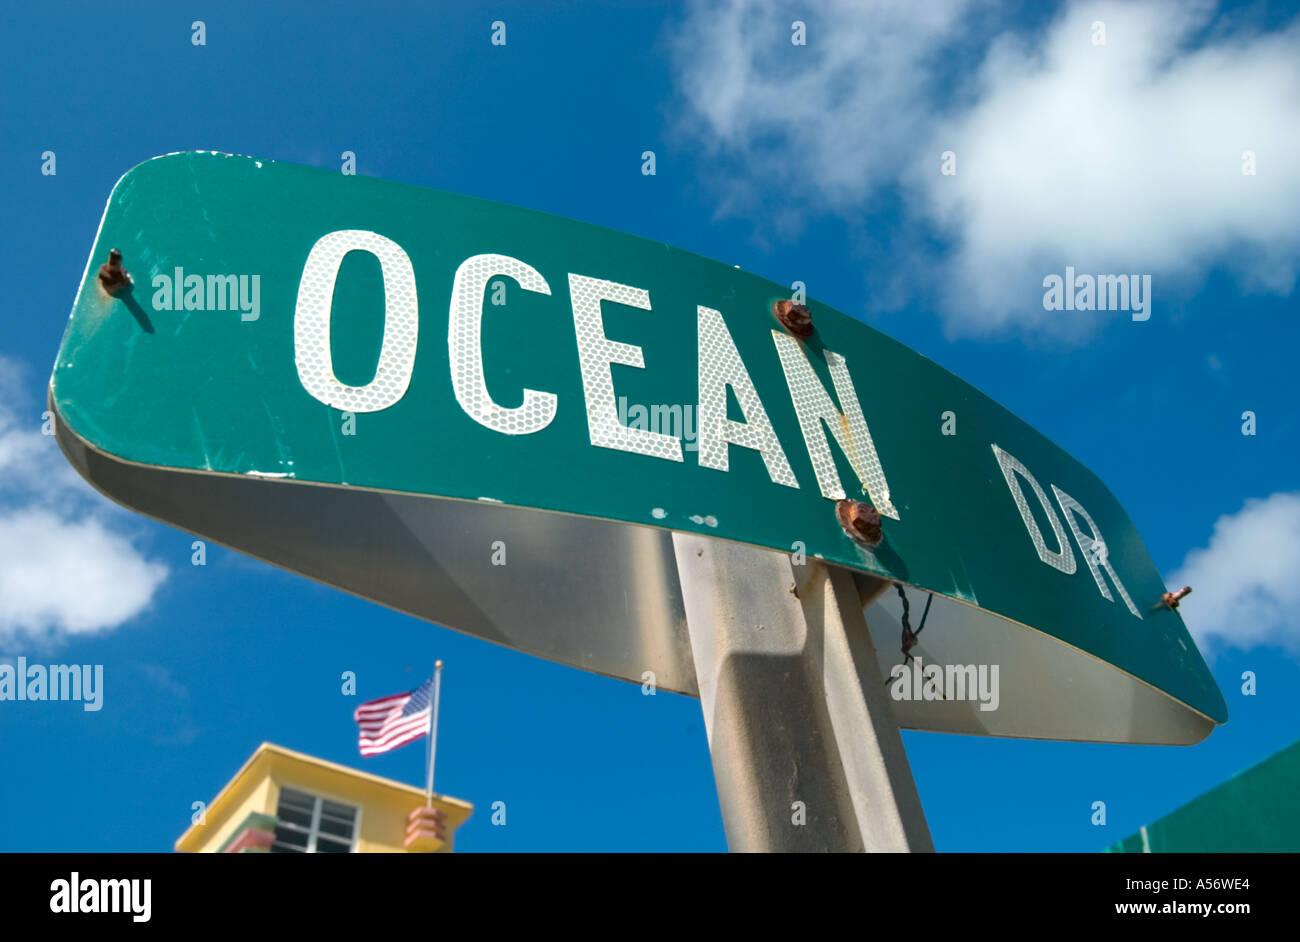 Ocean Drive street sign, South Beach, Miami, Florida, USA - Stock Image